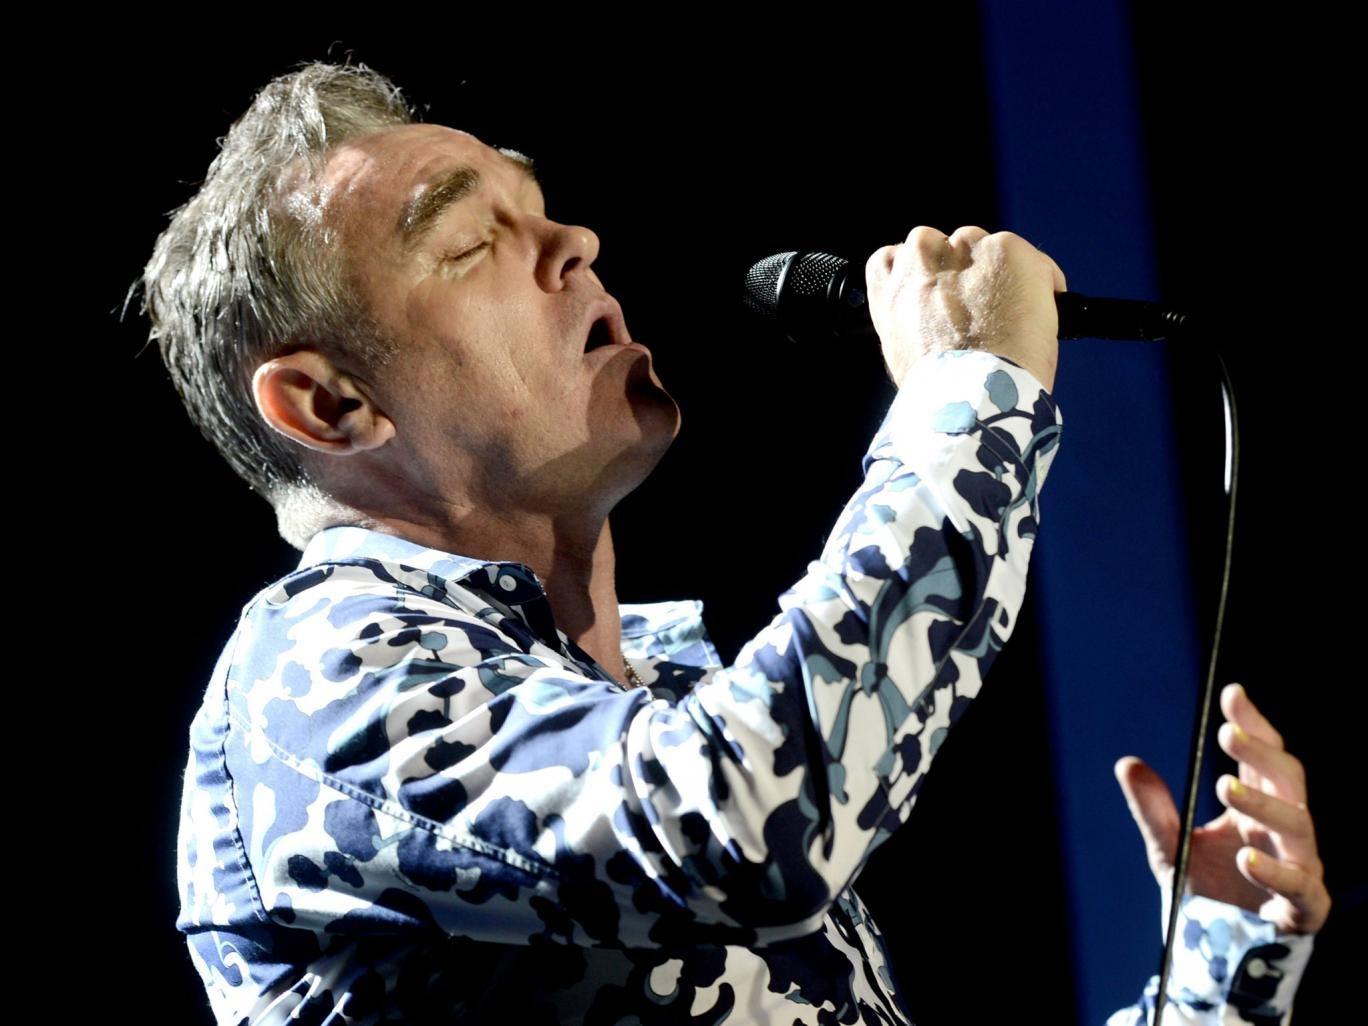 Former Smiths frontman Morrisey